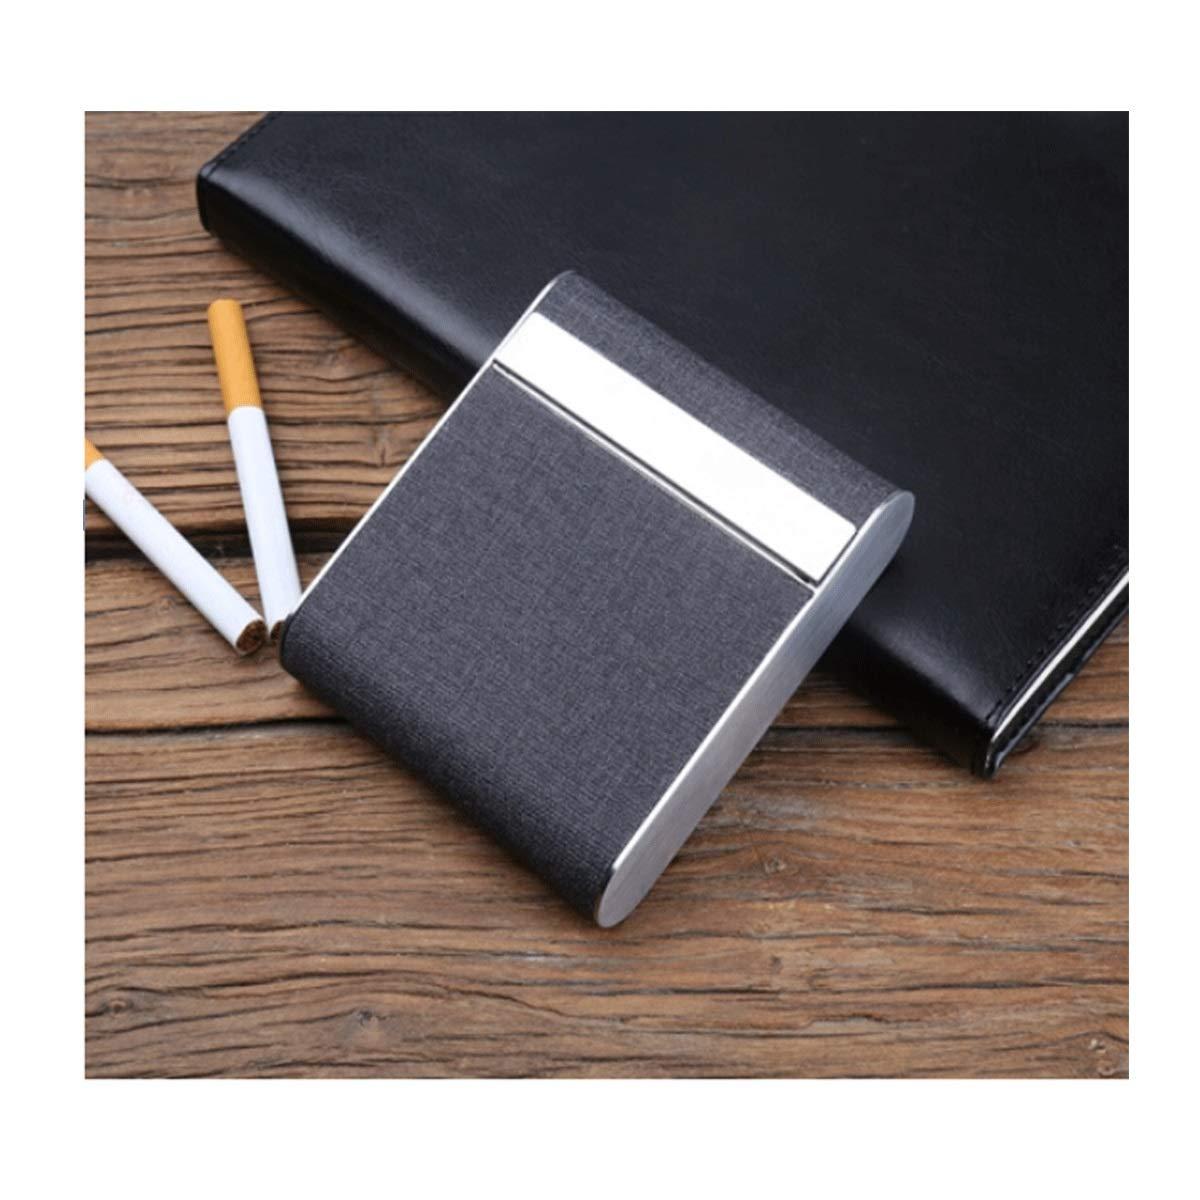 KALMAR Cigarette Box Creative Stainless Steel Portable Male And Female Personality Flip Cover Cigarette Case Fashion Cigarette Pack To Send Leadership To Send Boyfriend Can Accommodate 20 Cigarettes C